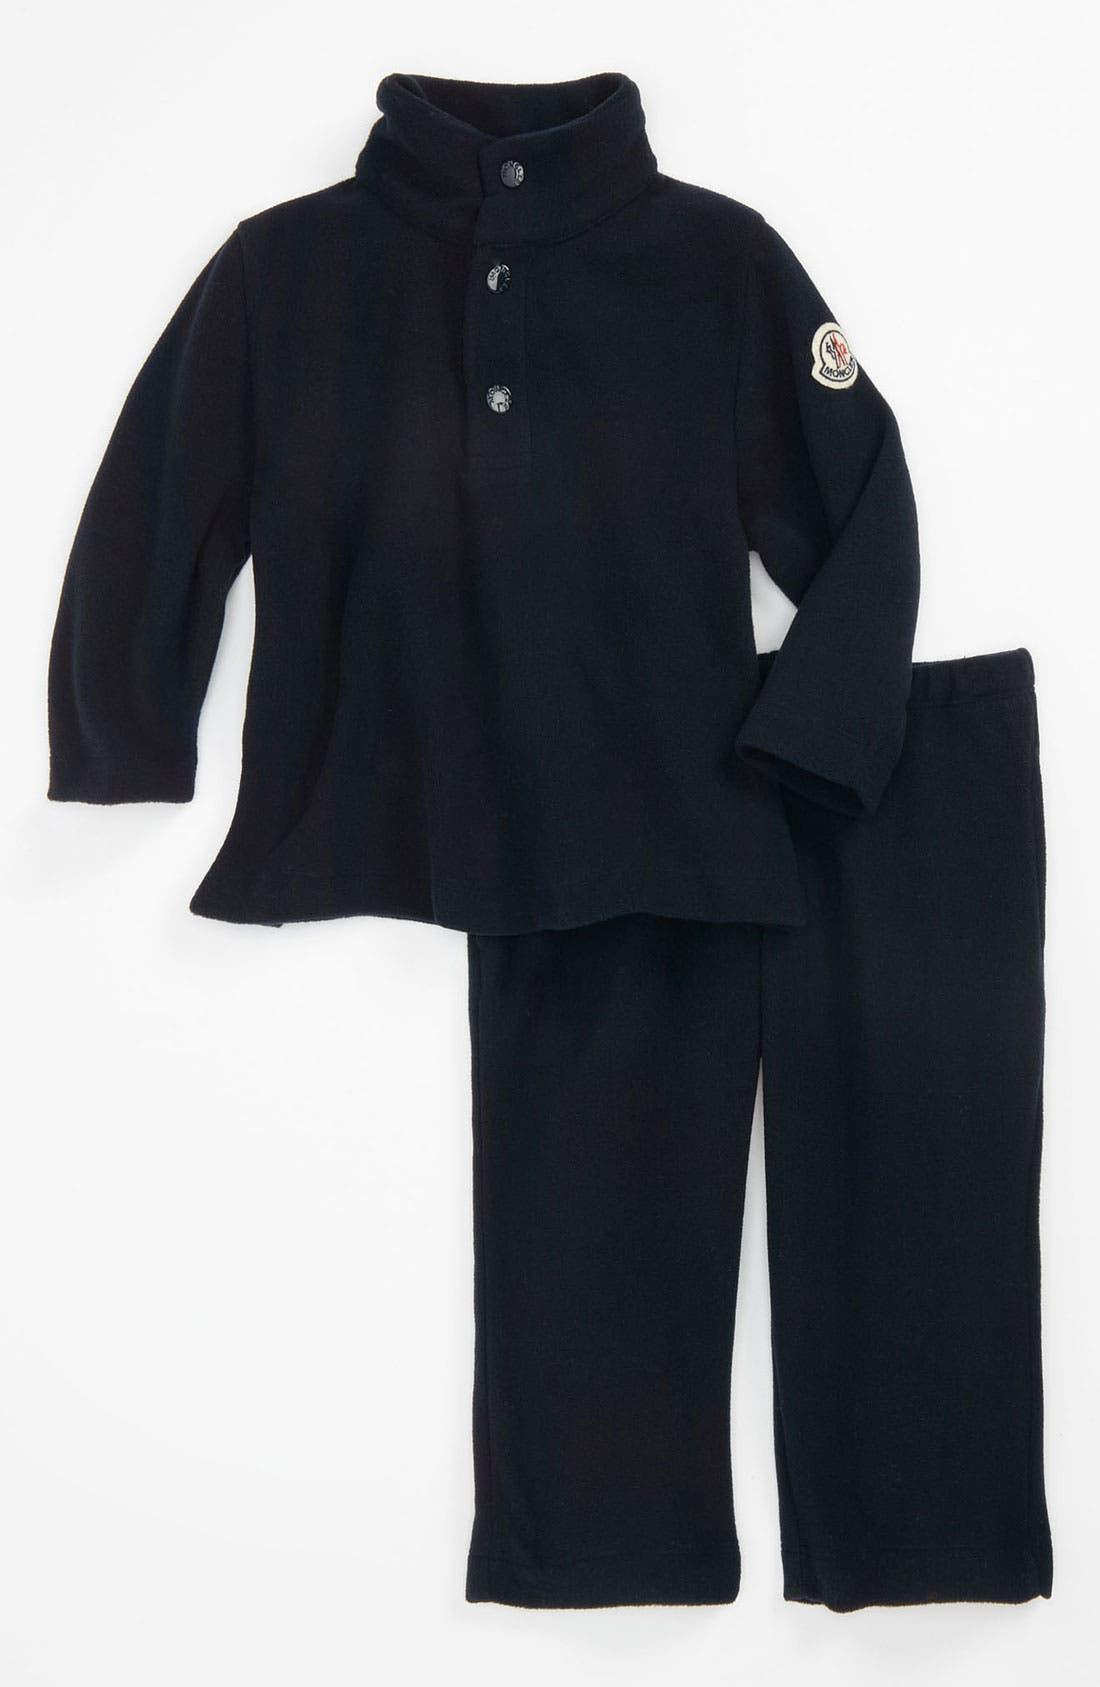 Alternate Image 1 Selected - Moncler Top & Pants (Infant)